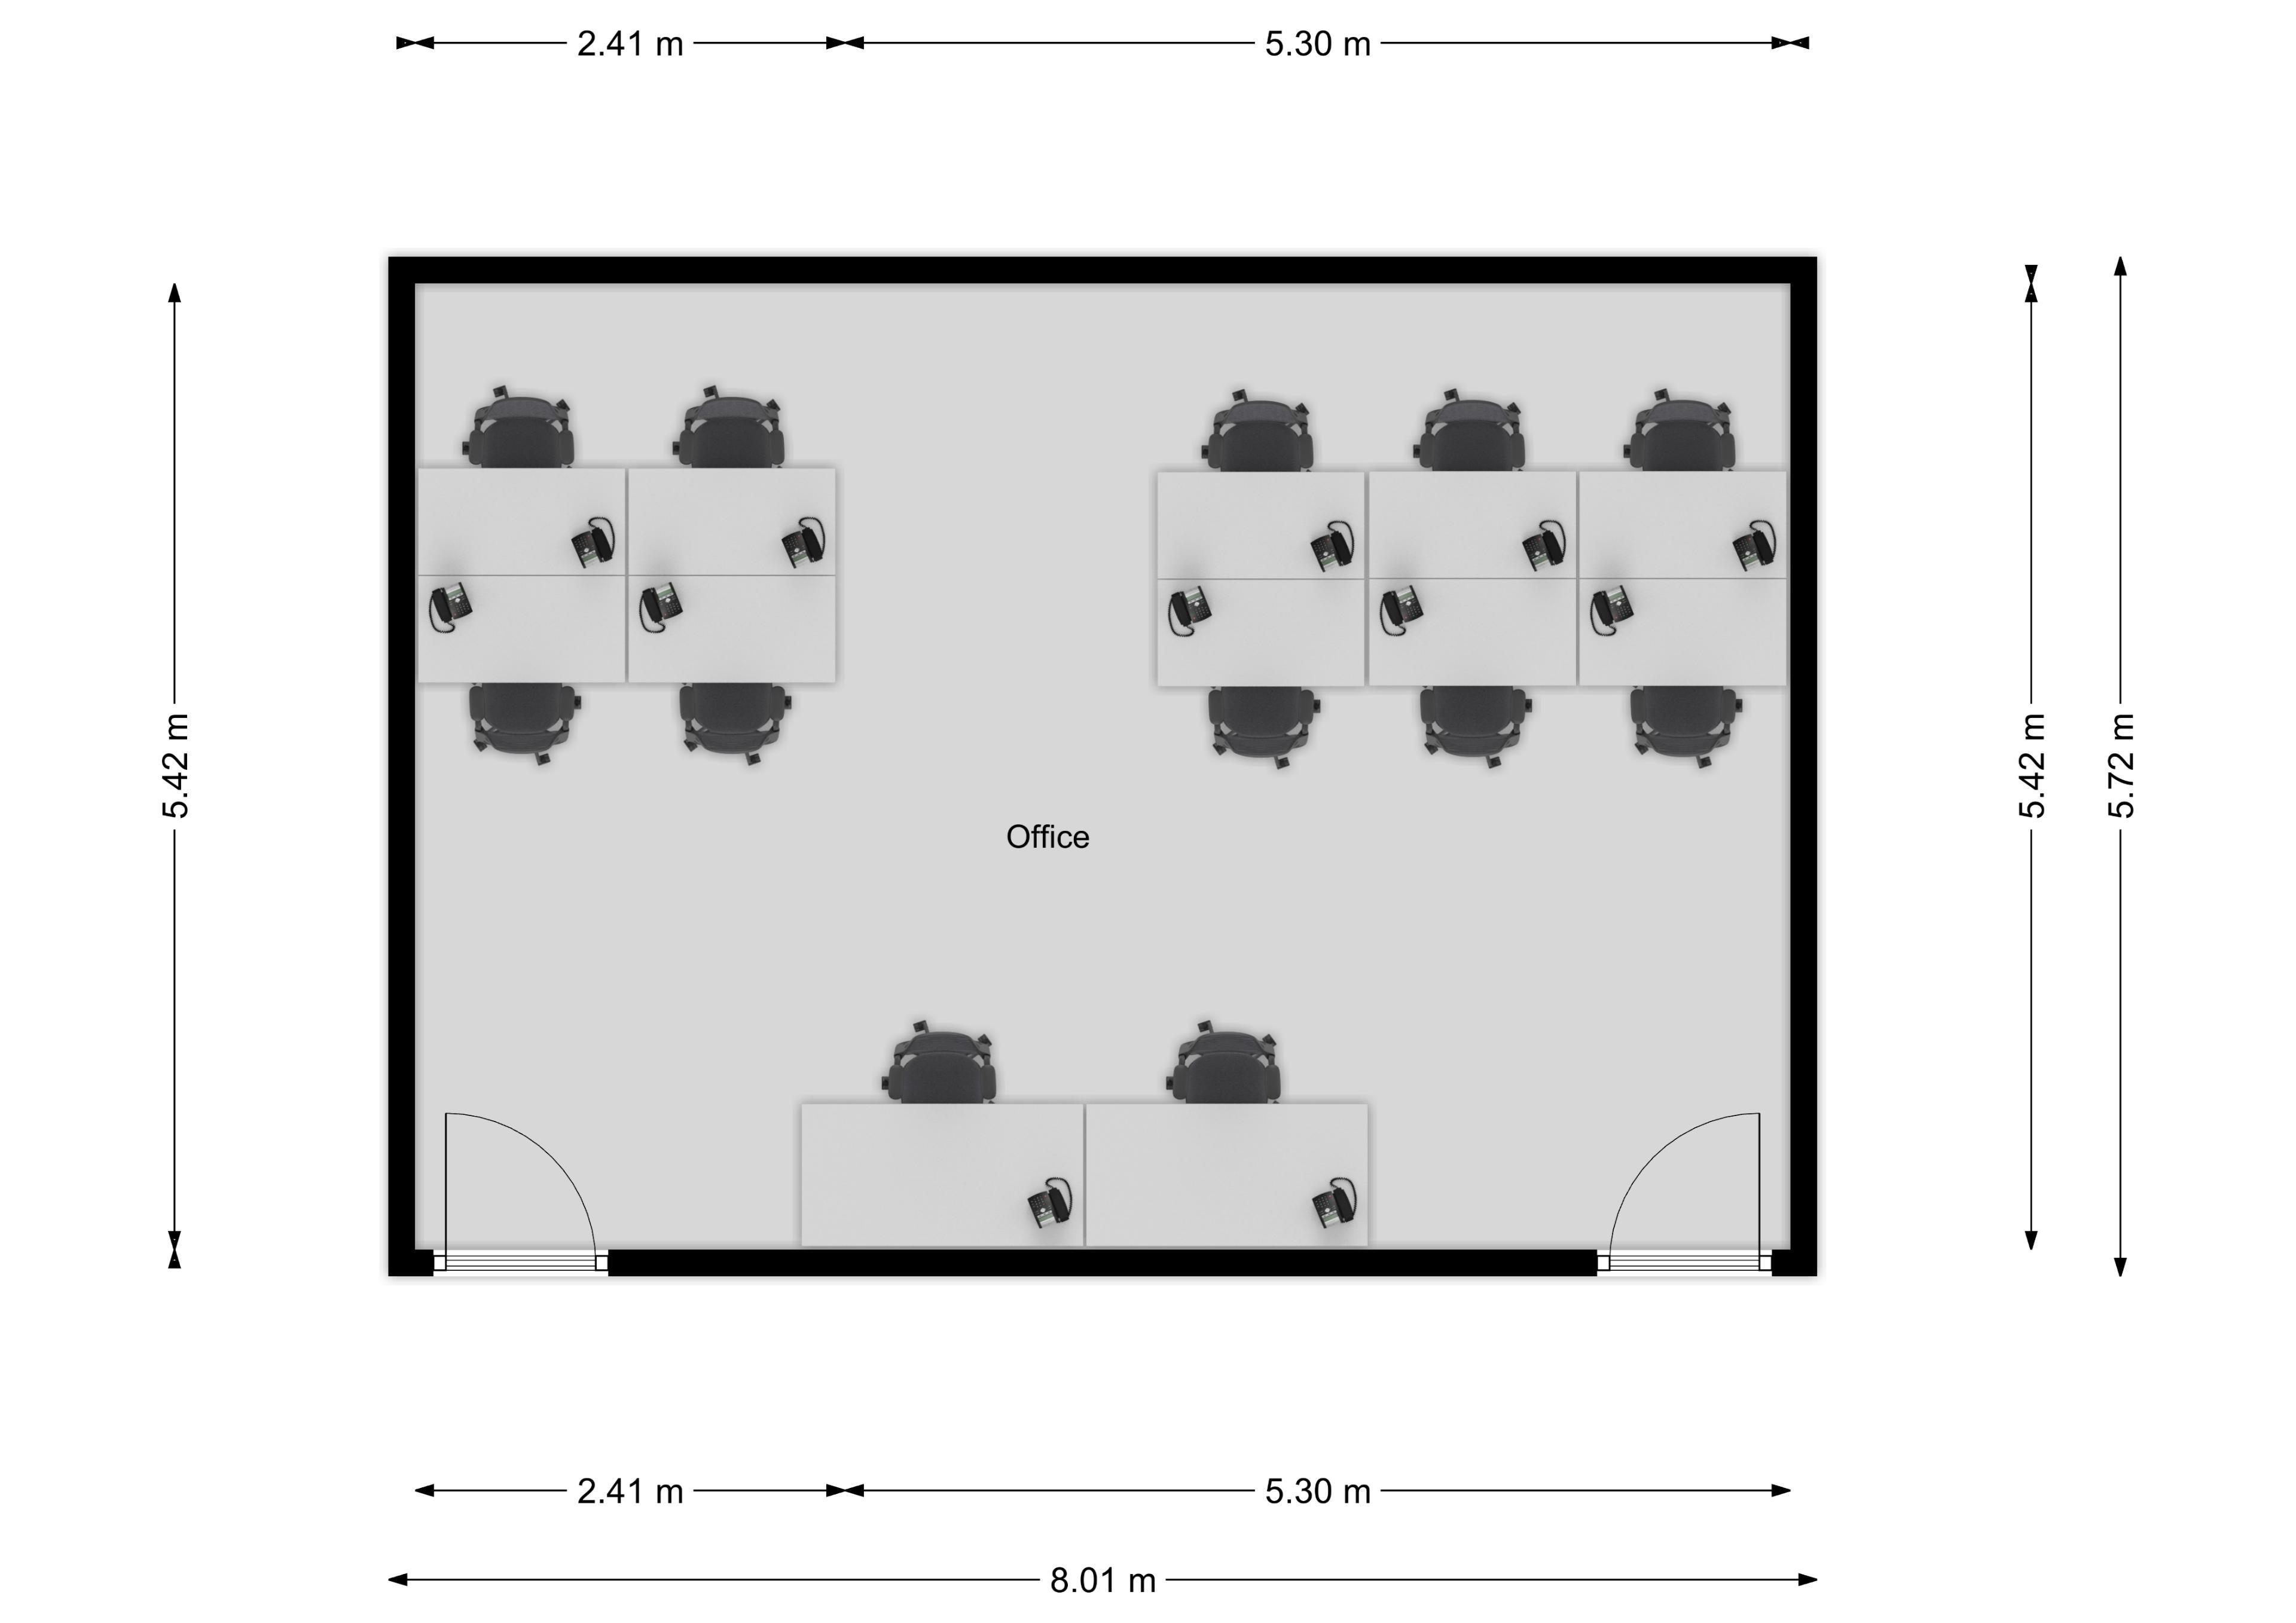 M7 Floor Plan (12 person)